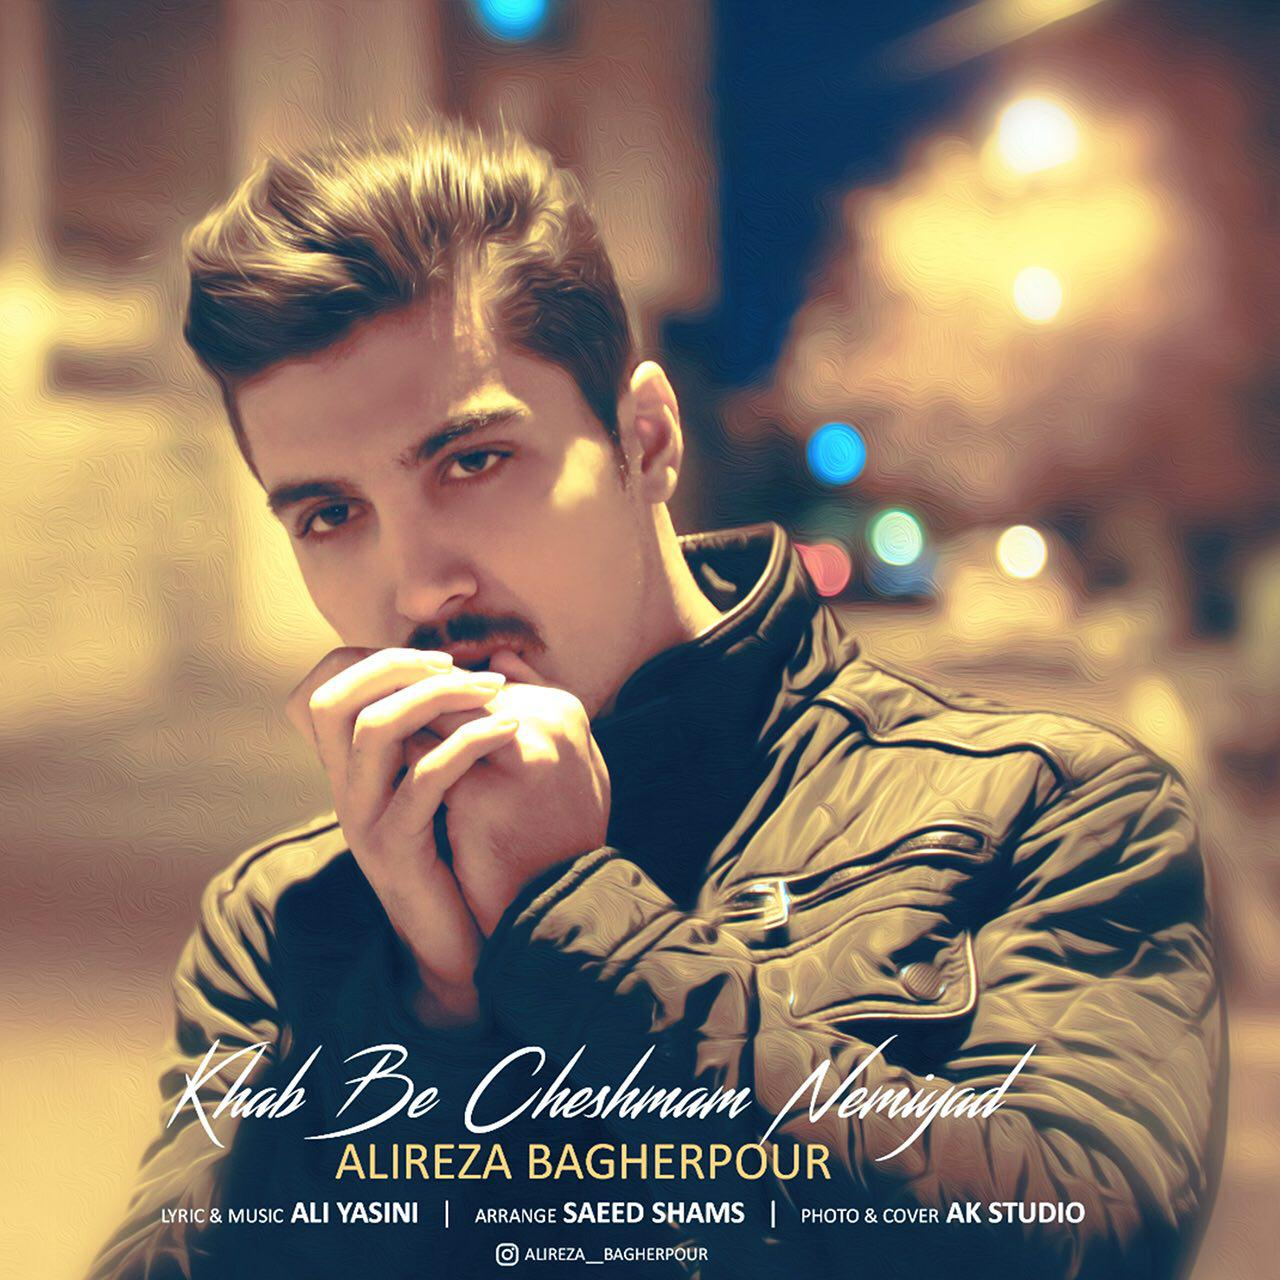 Alireza Bagherpour – Khab Be Cheshmam Nemiyad